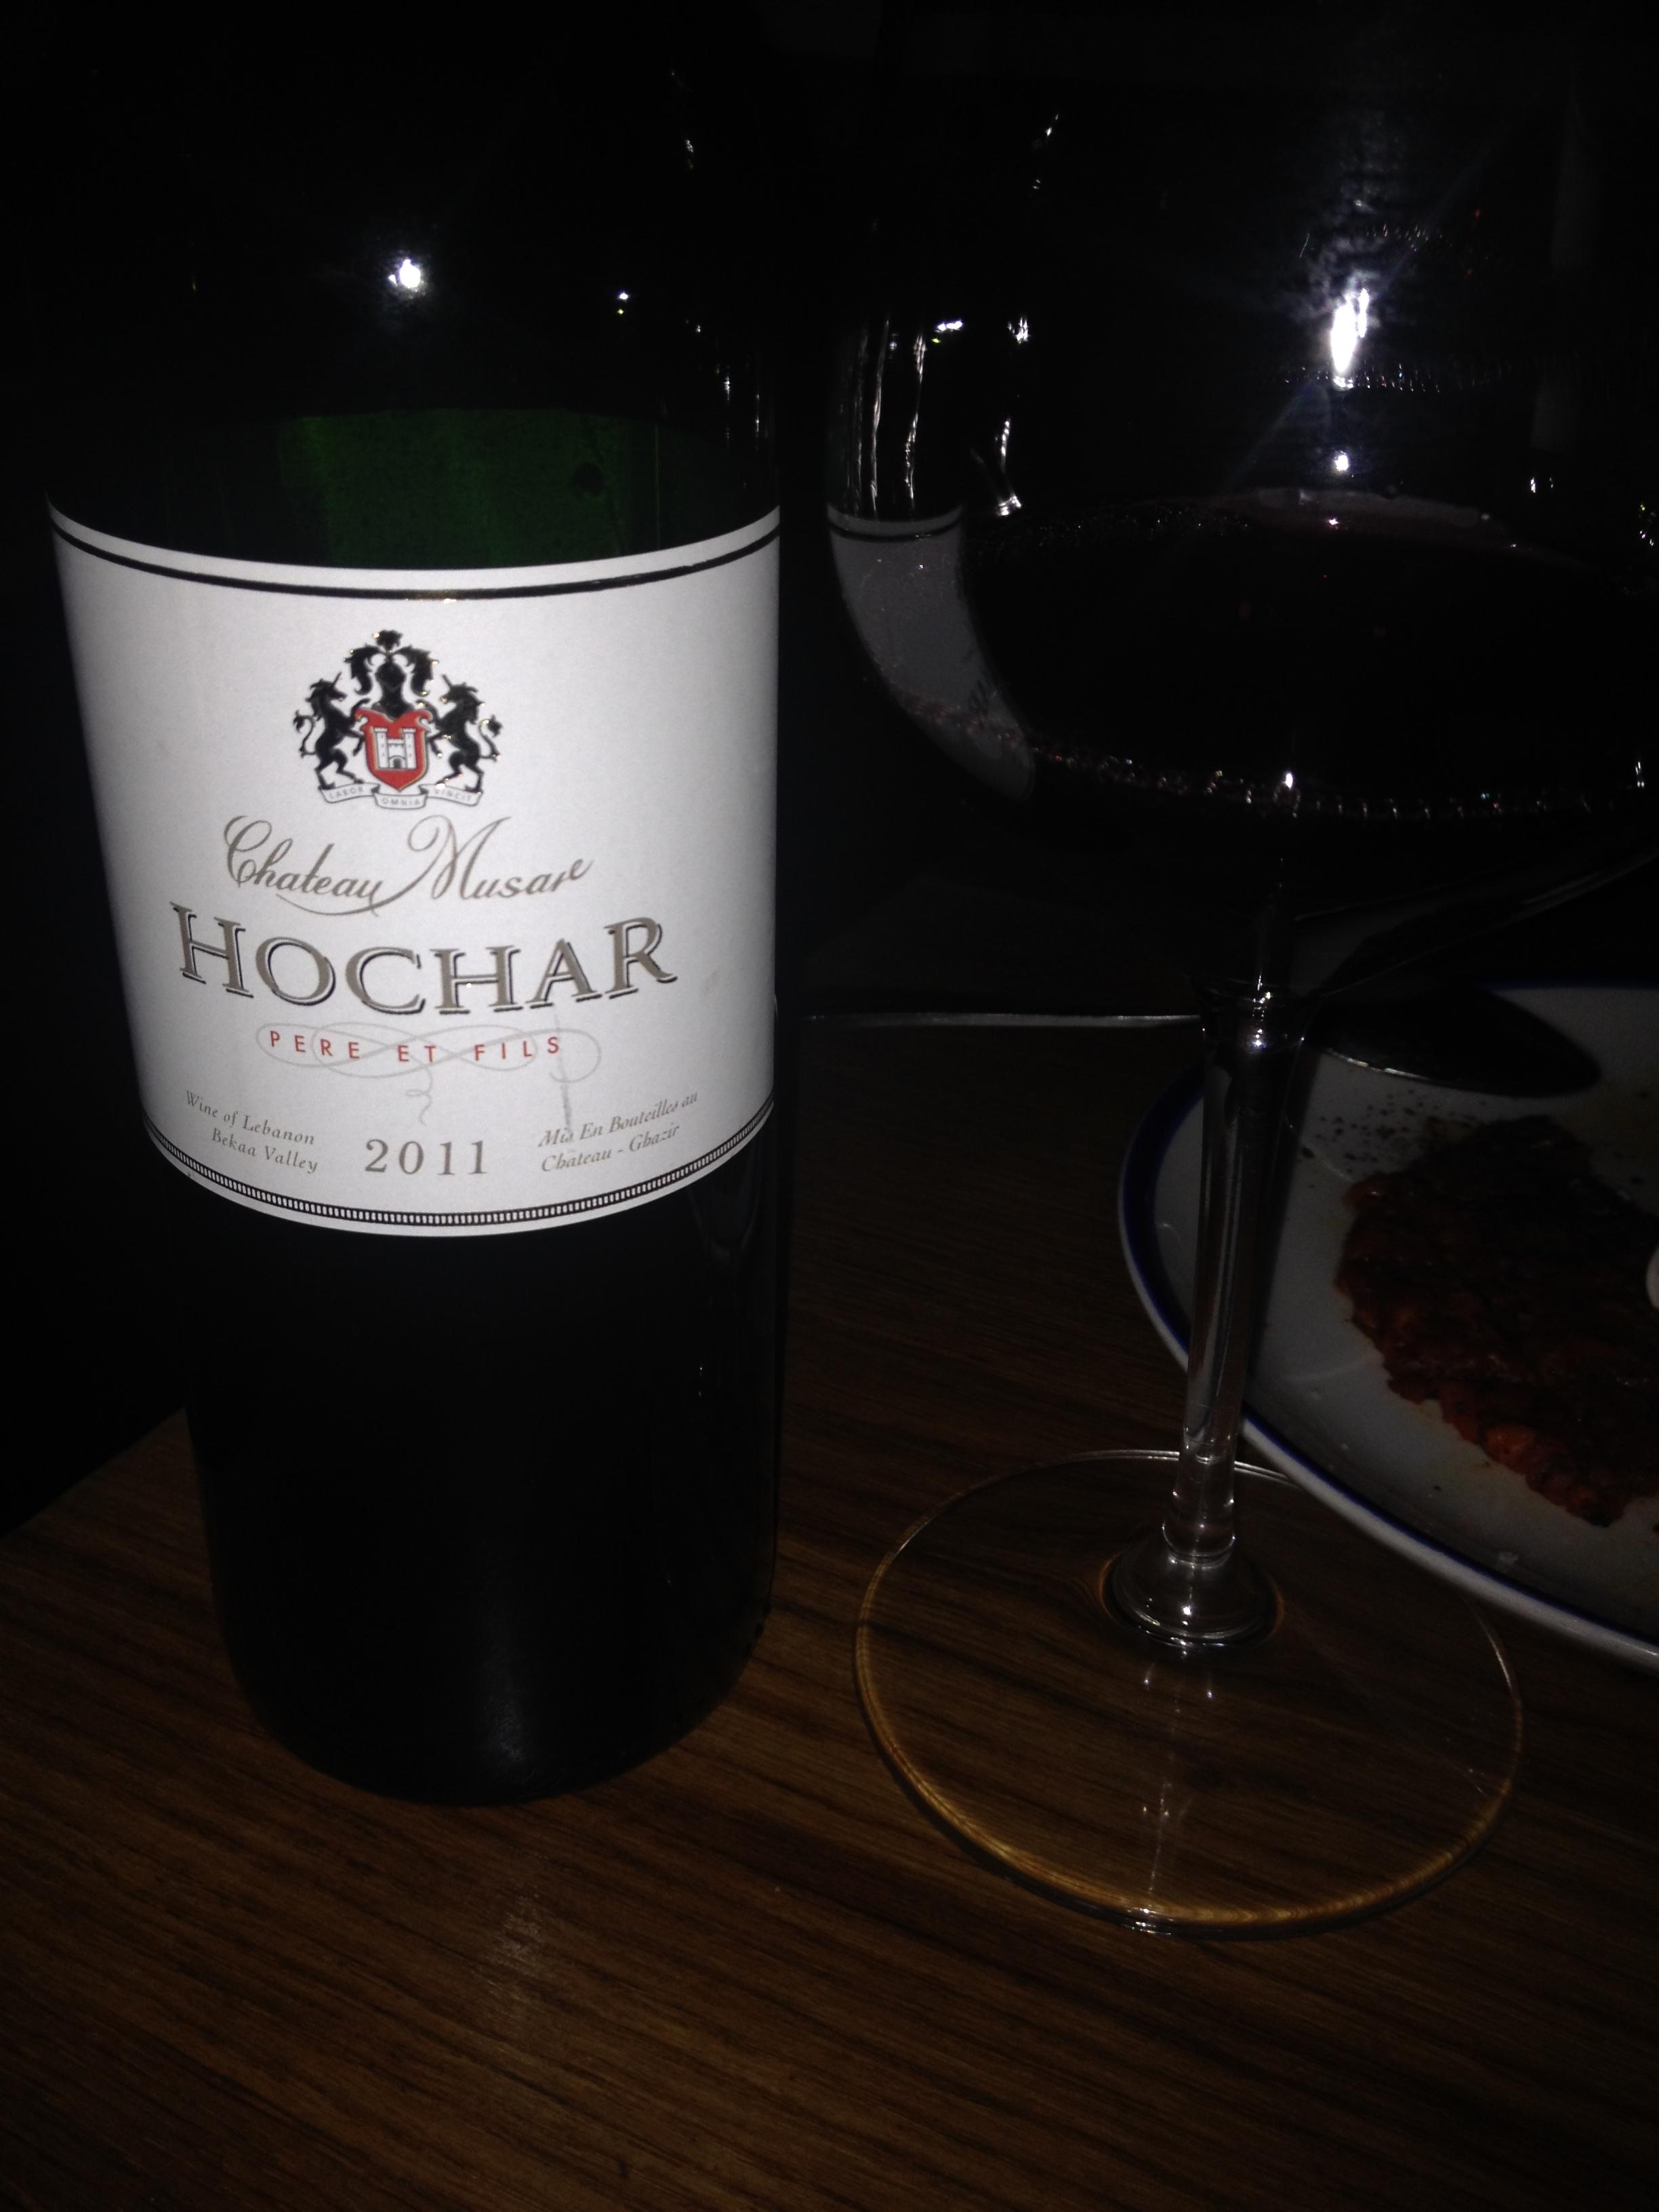 hochar-2011-1